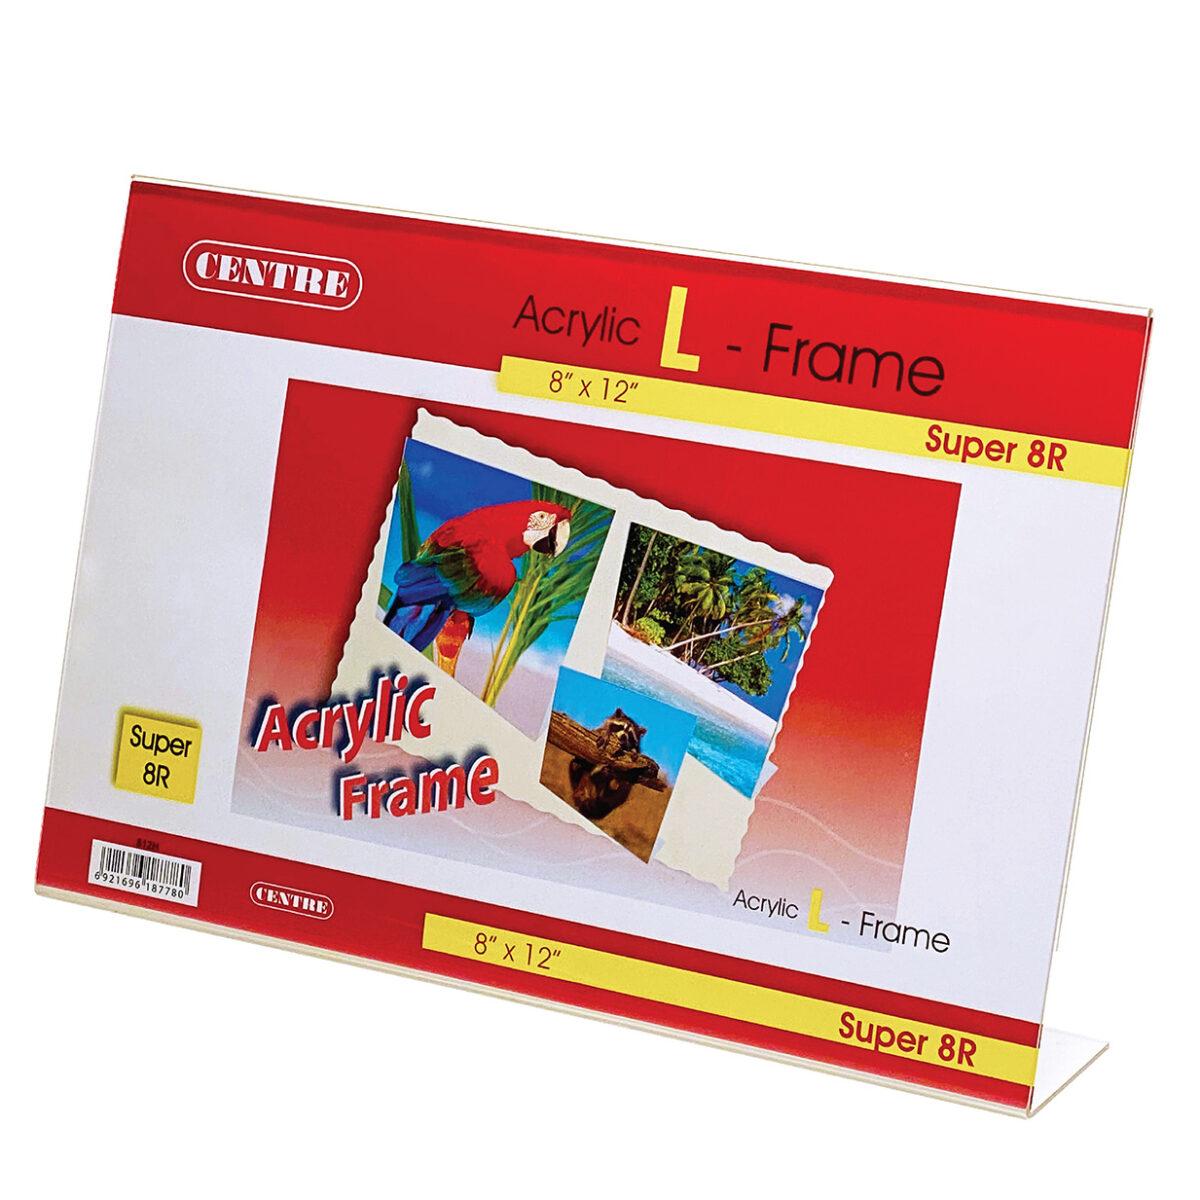 Centre Acrylic Picture Frame - L Stand Landscape Super 8R